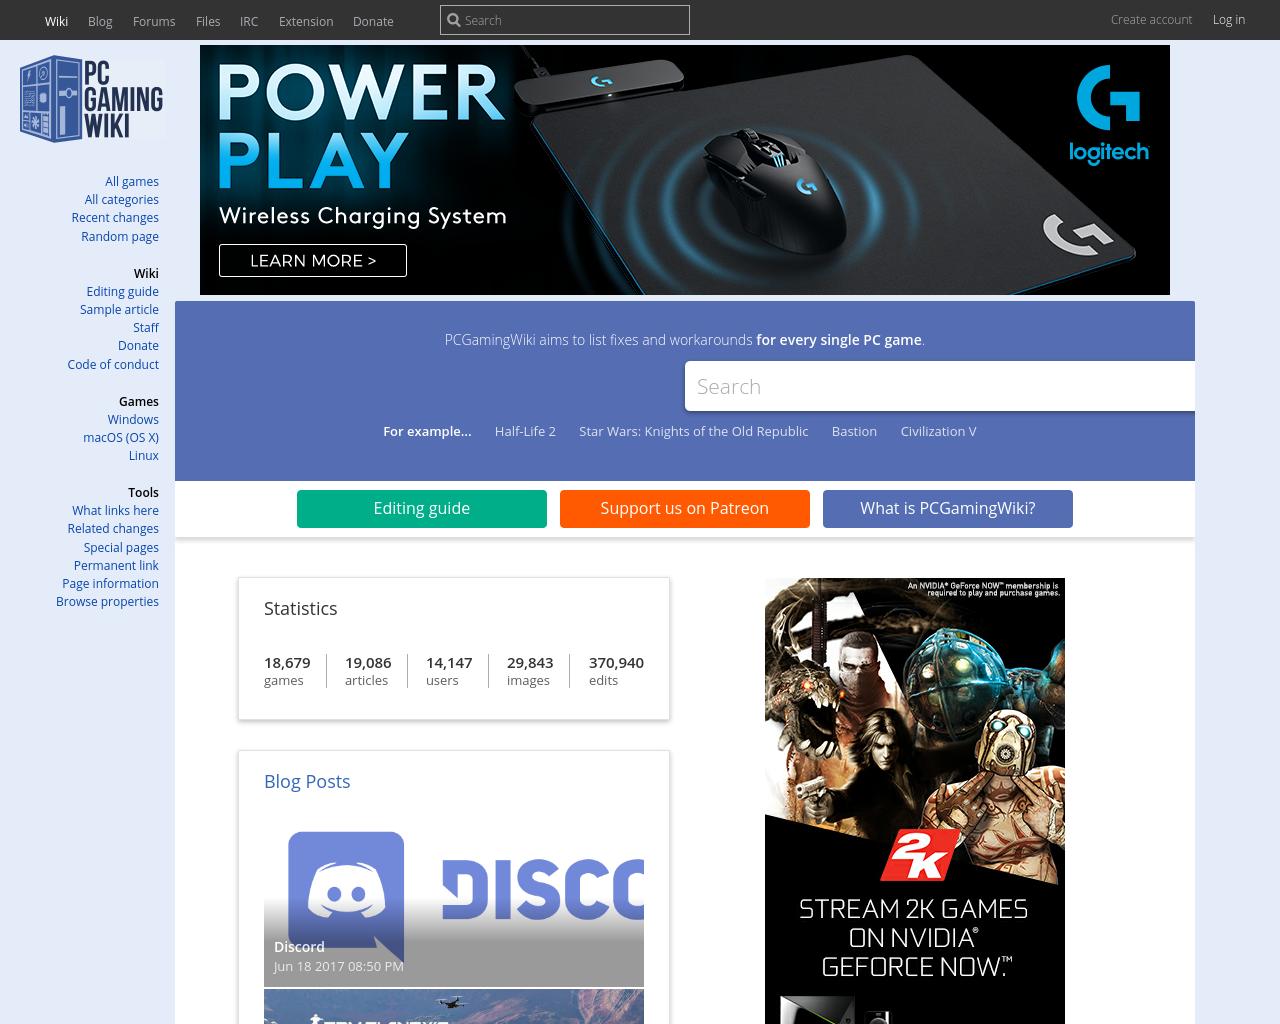 PCGamingWiki-Advertising-Reviews-Pricing